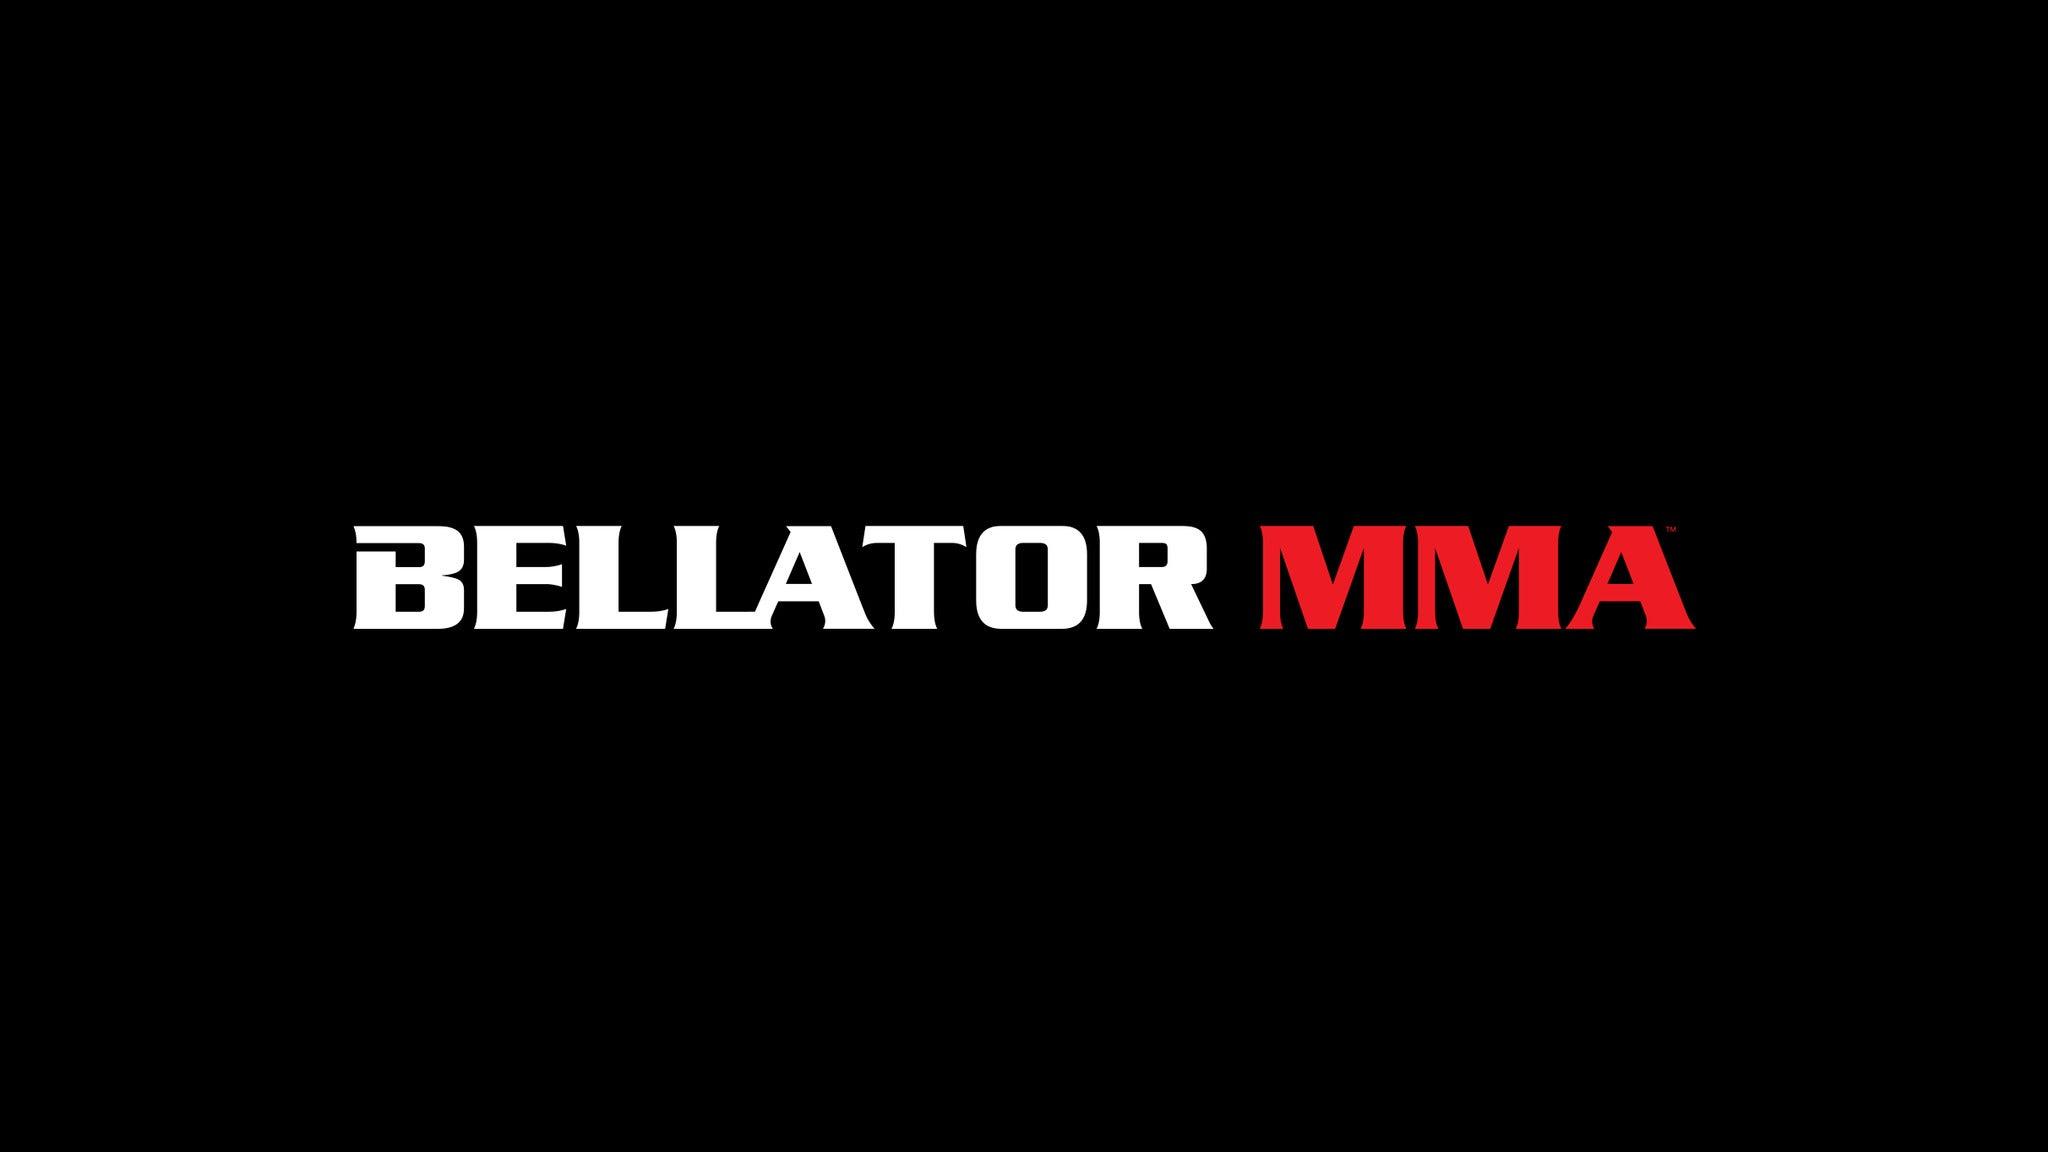 Bellator MMA presale code for early tickets in Inglewood